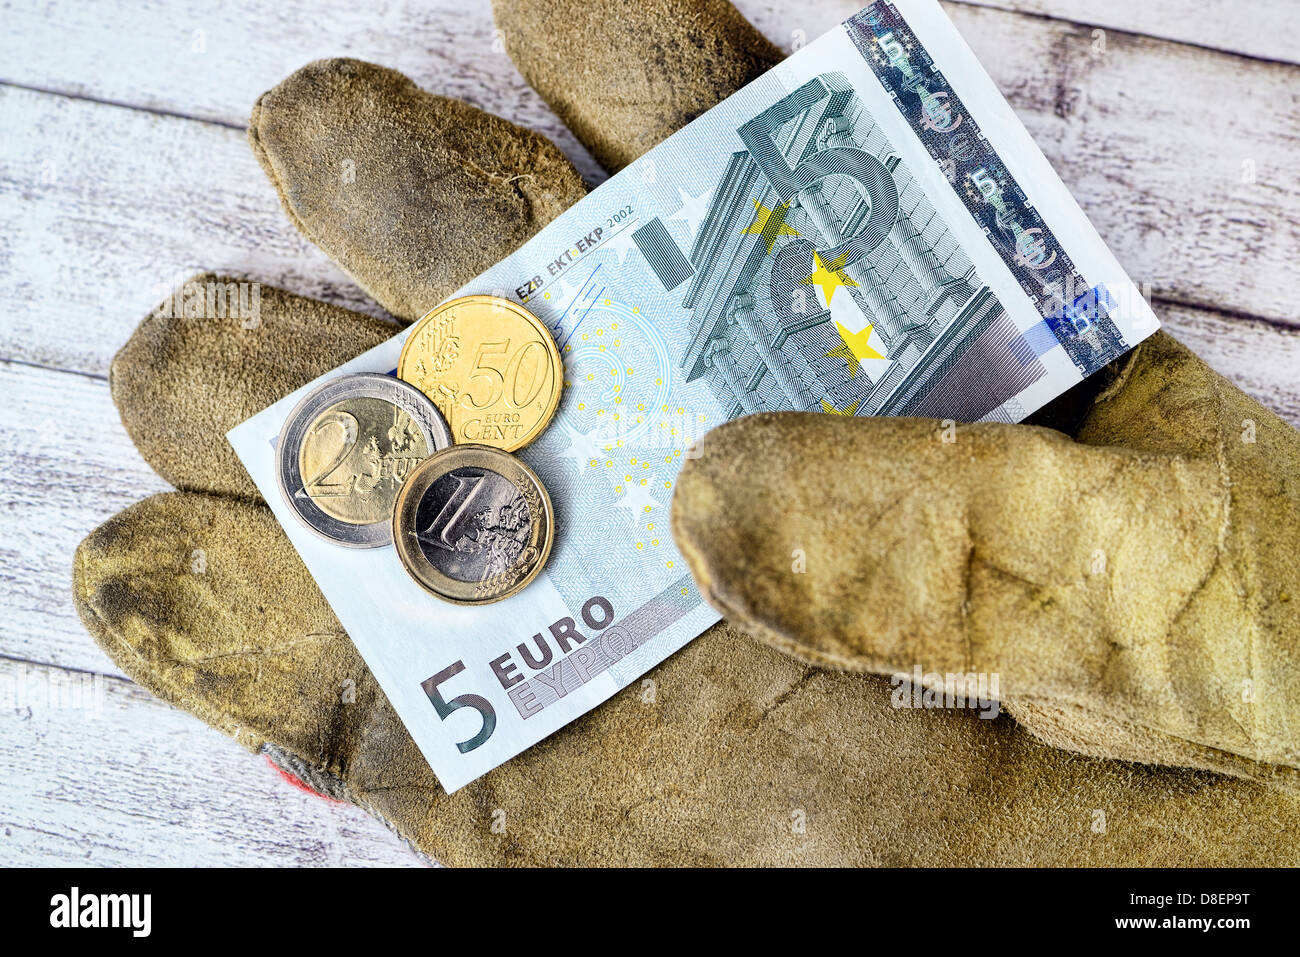 Work Glove with 8.50 euro minimum wage - Stock Image